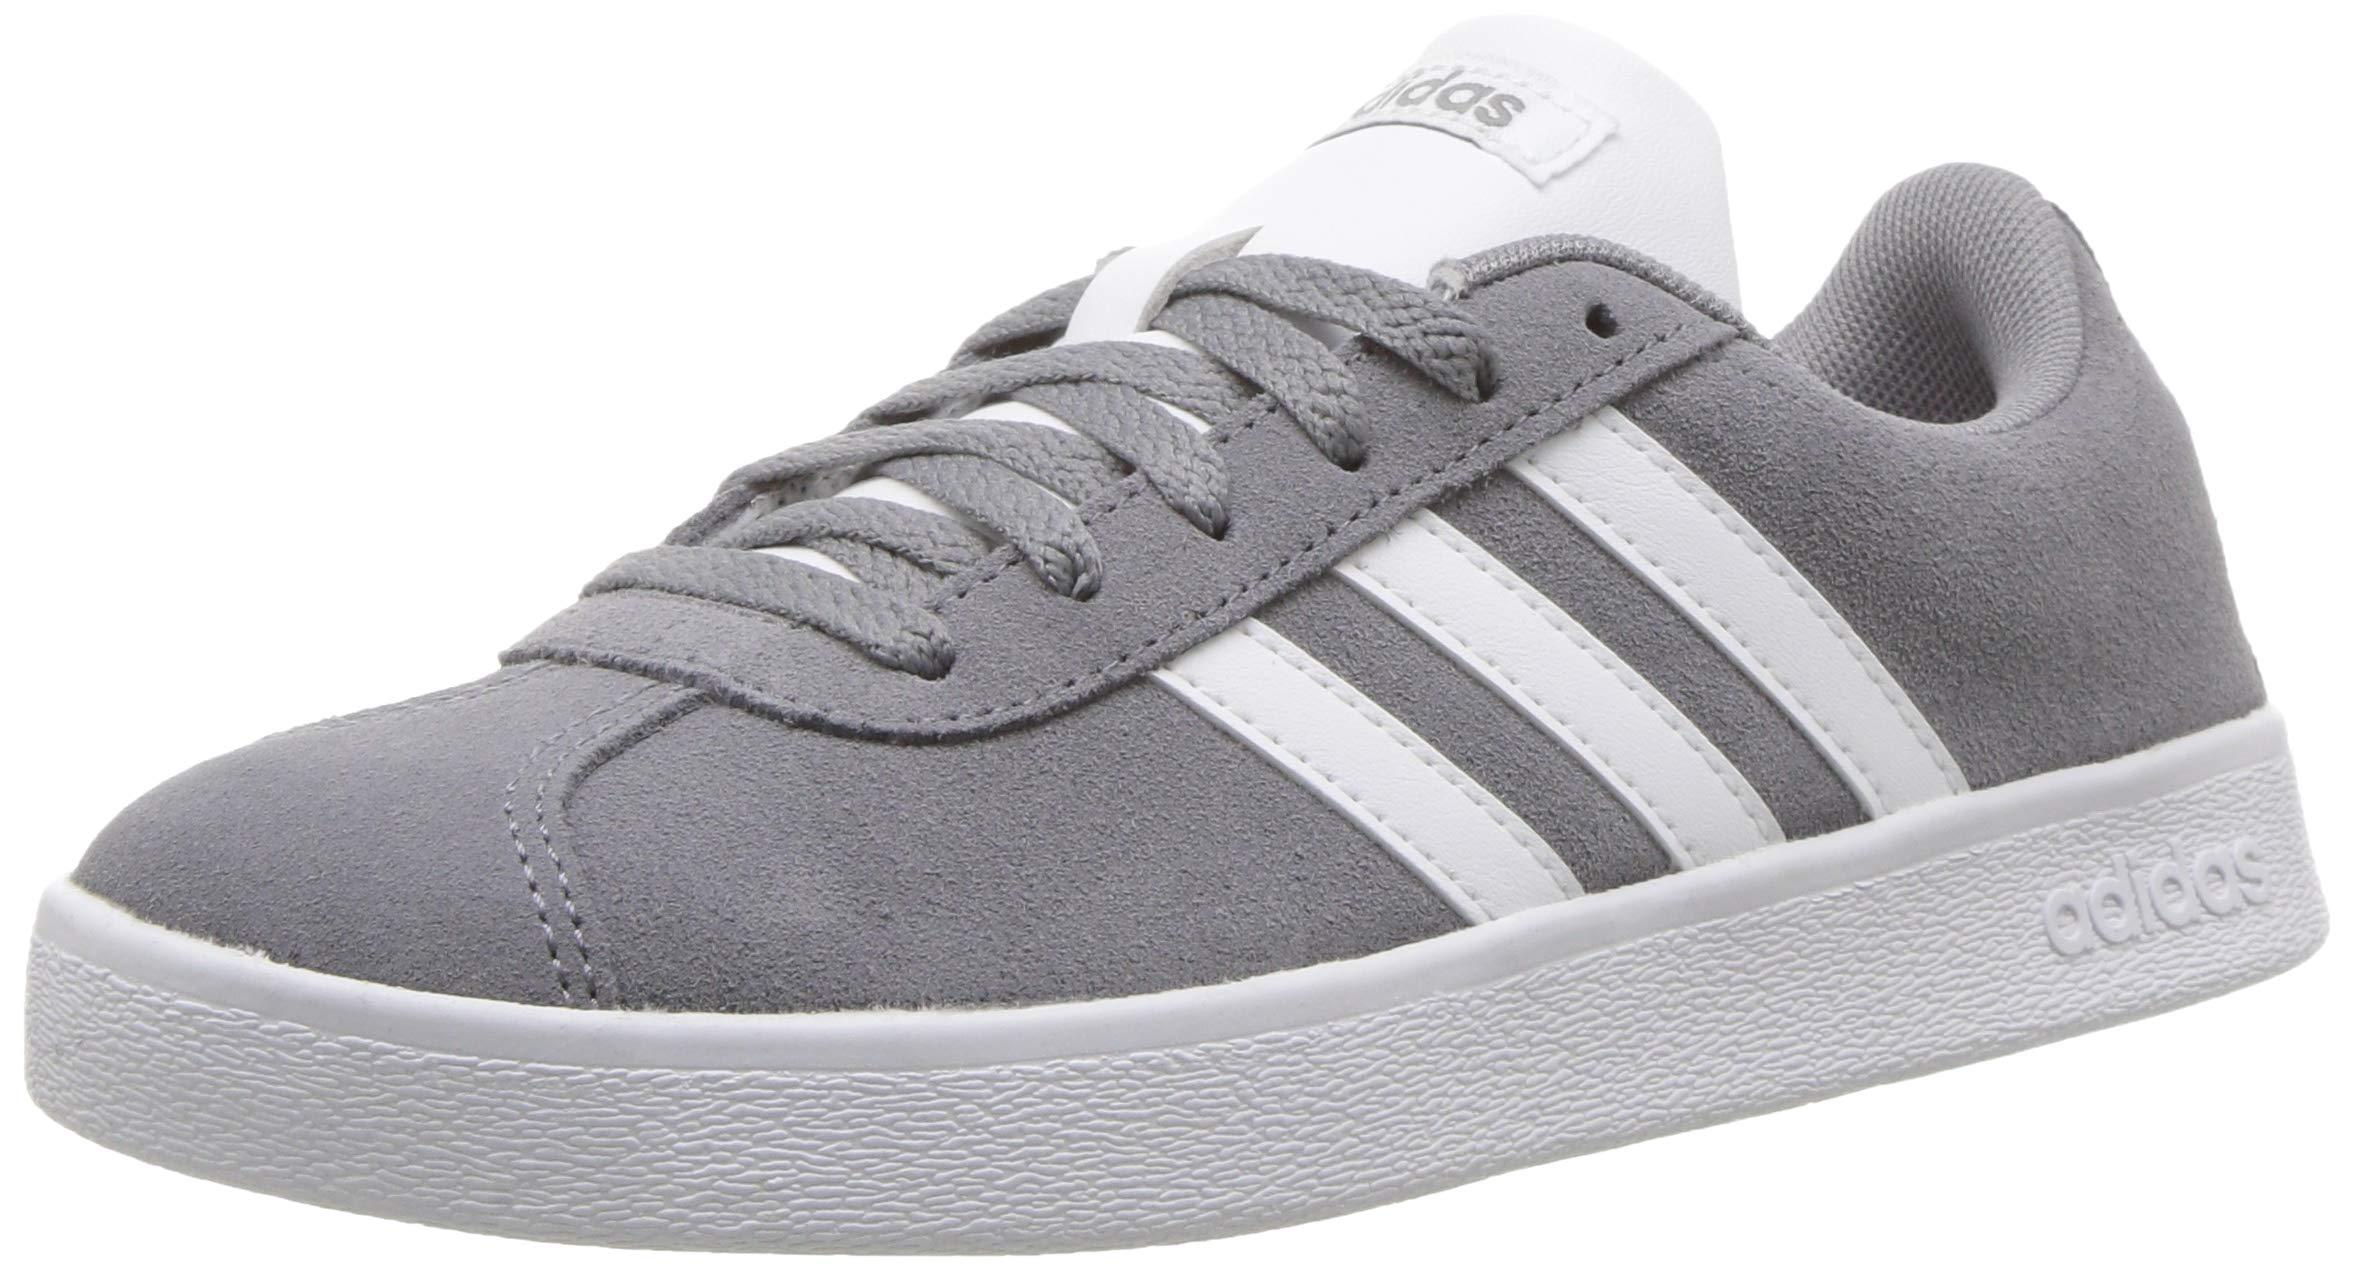 adidas Kids' VL Court 2.0 Sneaker, Grey/White/Grey, 1 M US Little Kid